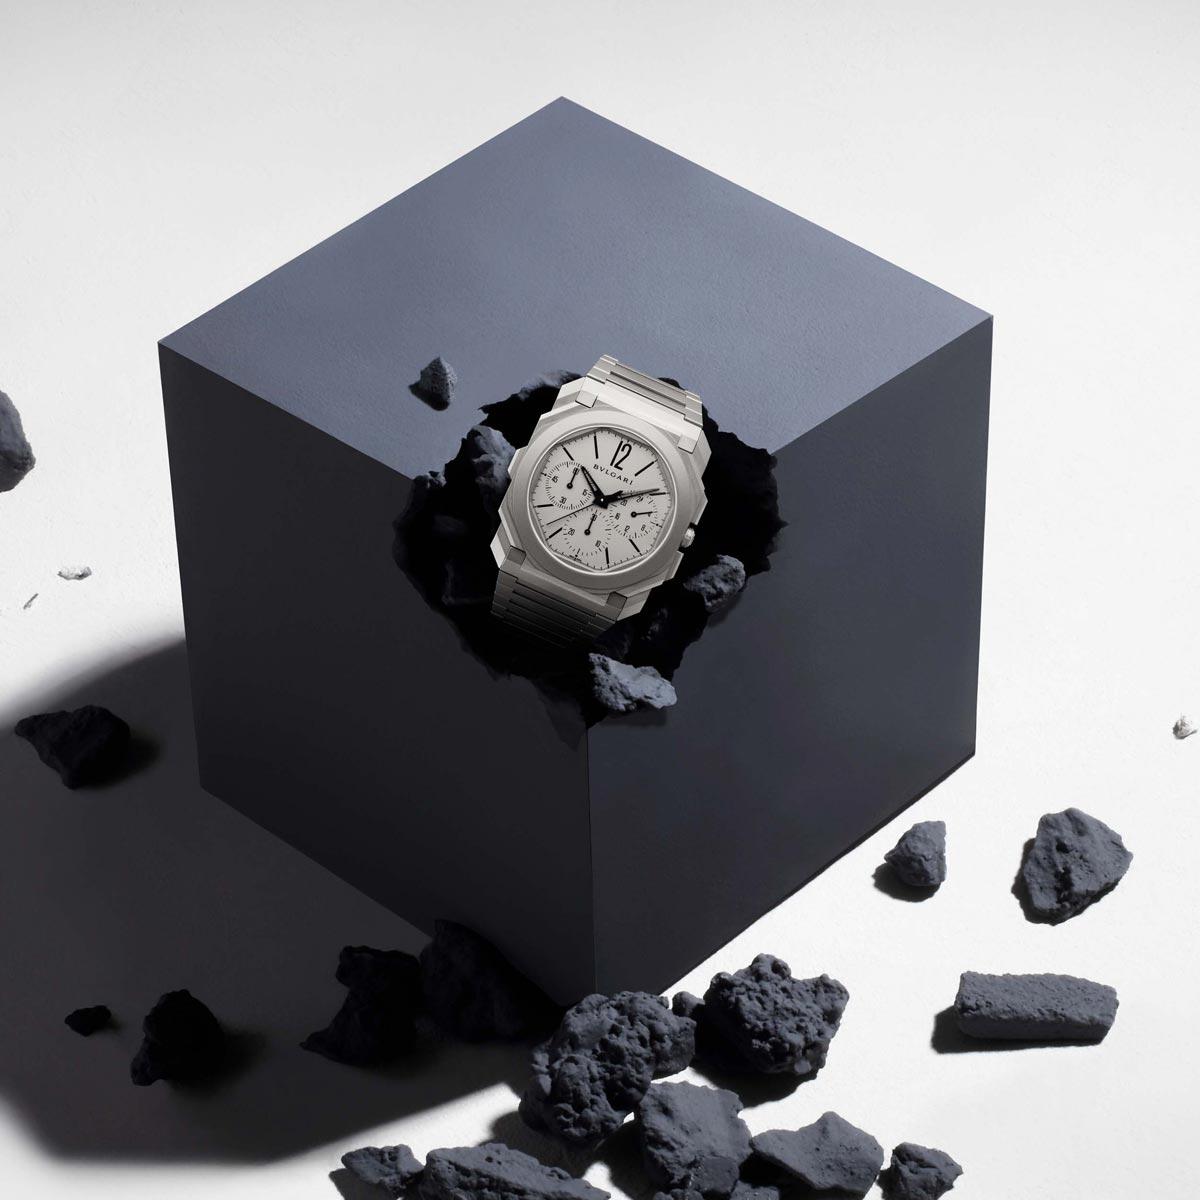 La Cote des Montres : Photo - Prix de la montre chronographe : Bvlgari Octo Finissimo Chronographe GMT Automatique